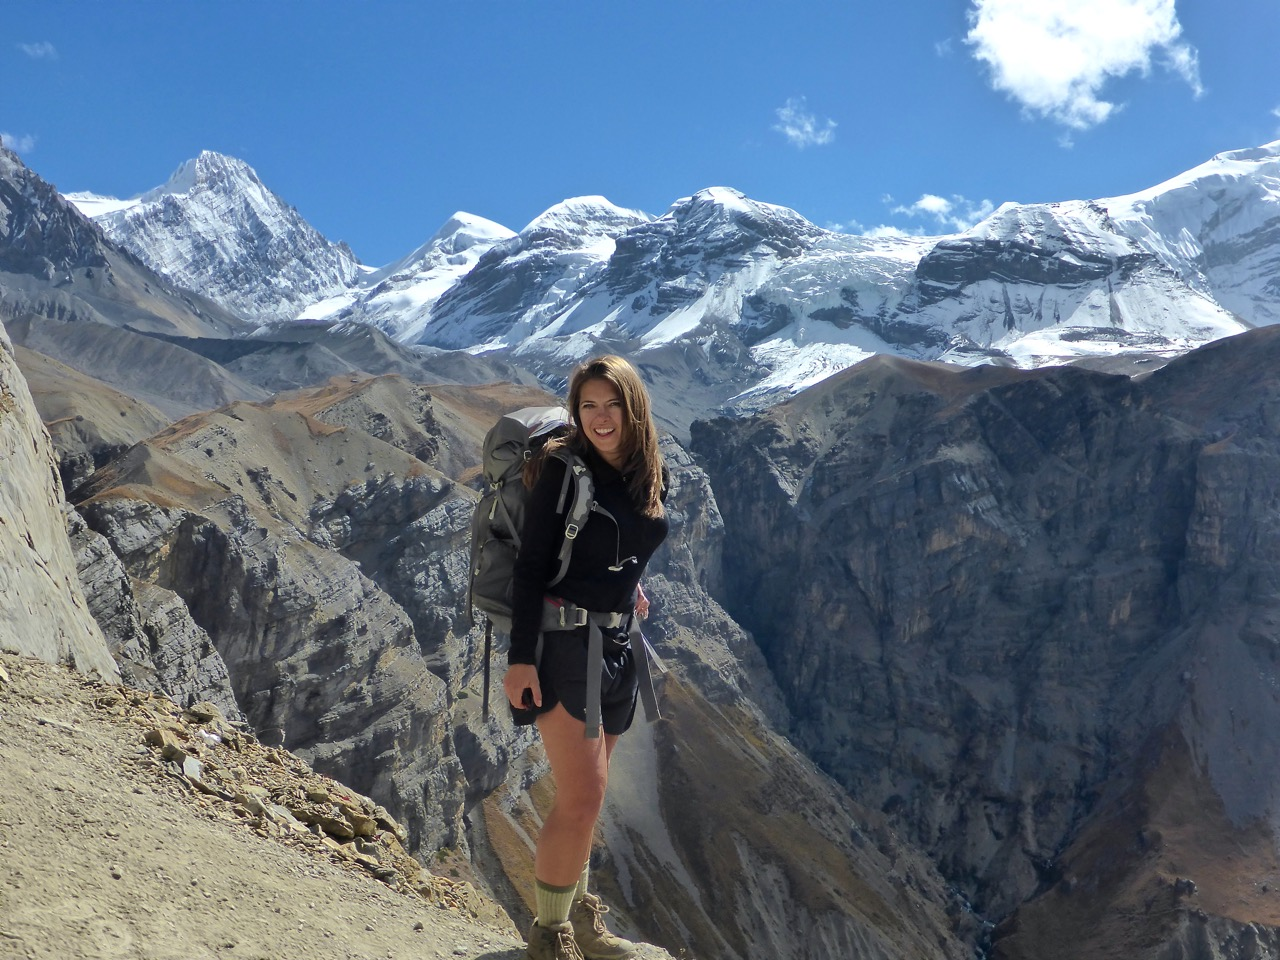 Throng La High Camp, Annapurna Circuit Nepal